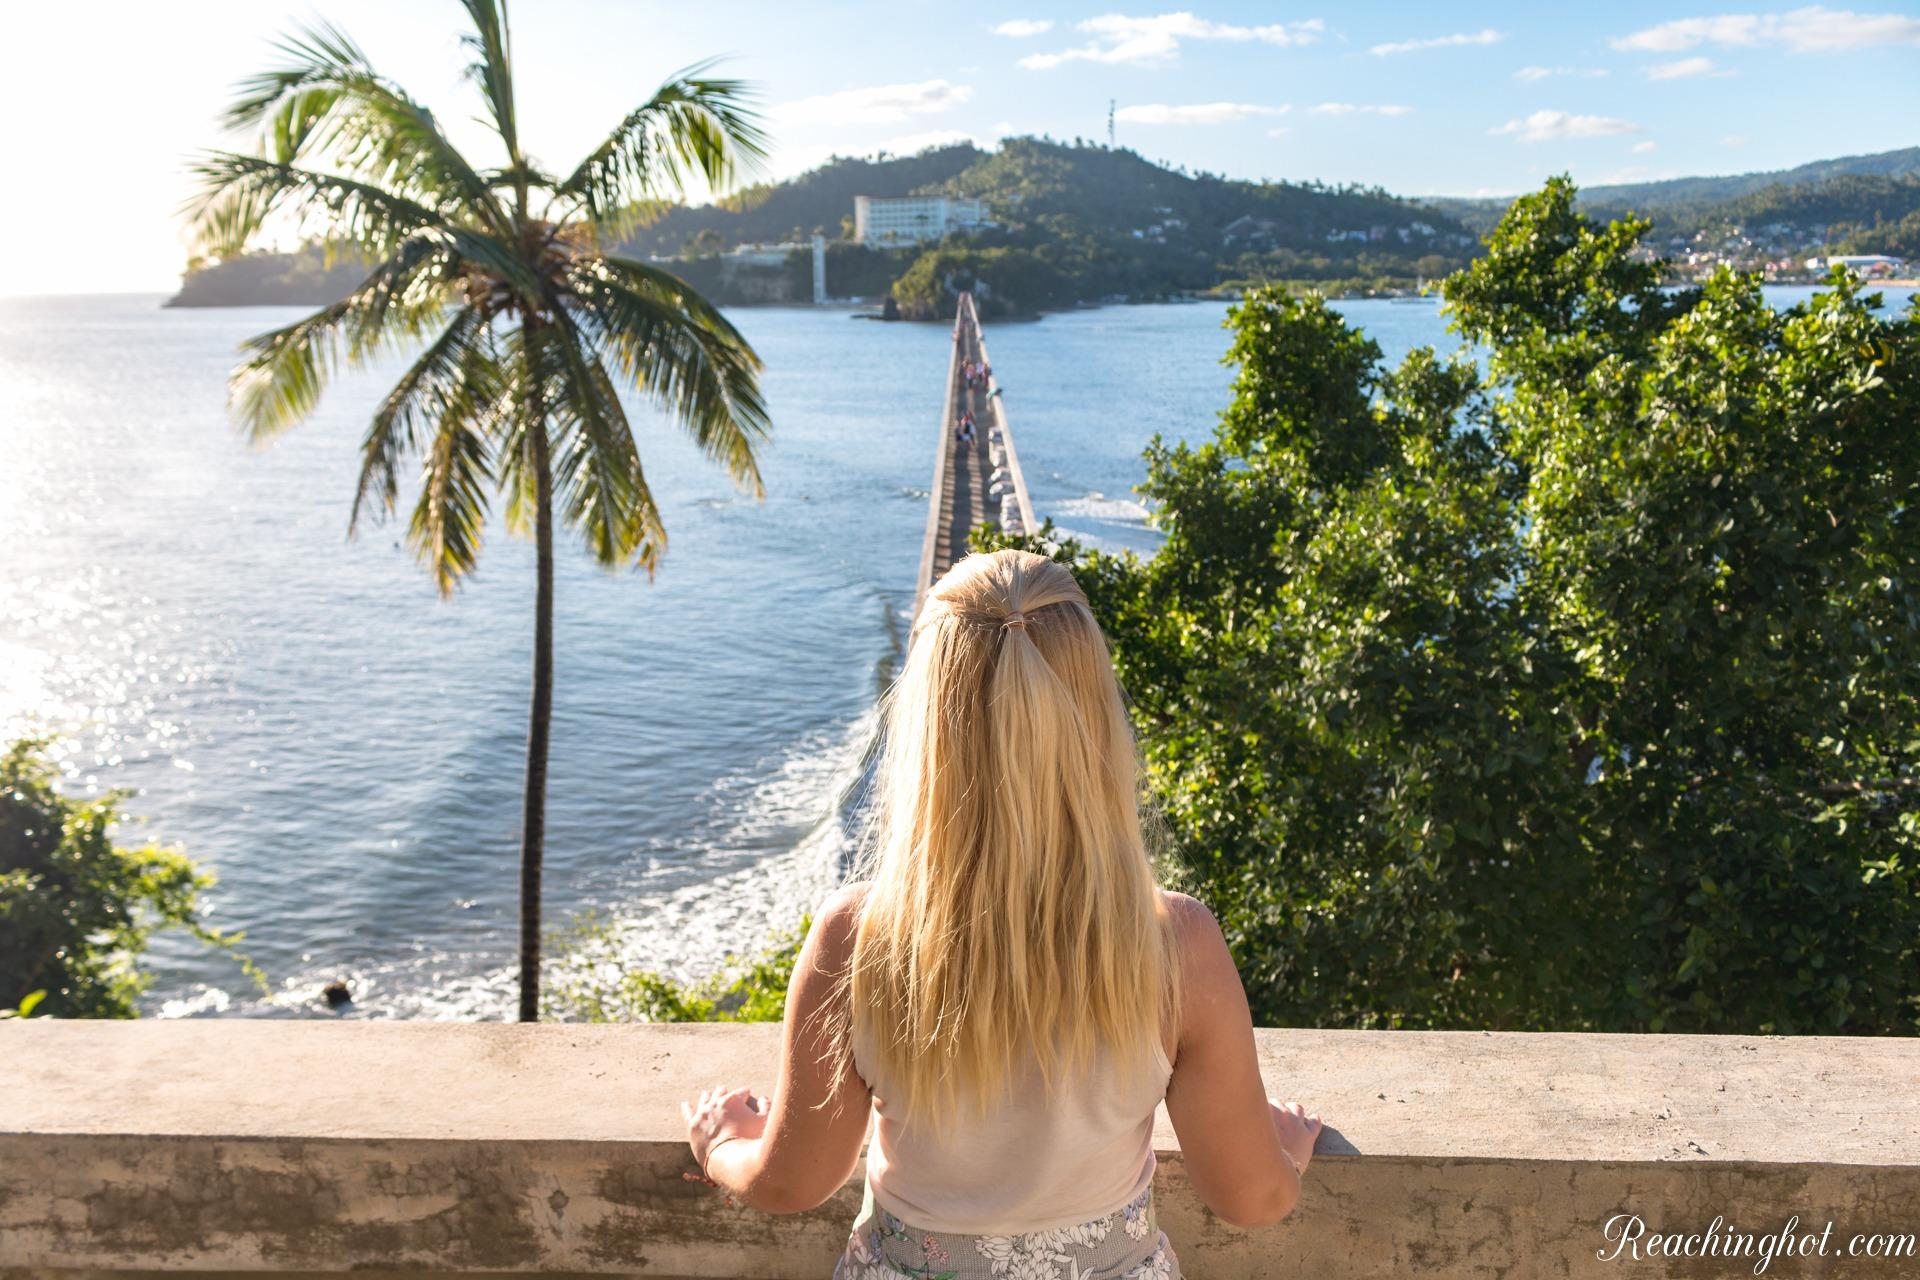 Reachinghot travelblogger at Samaná bridge in Dominican Republic